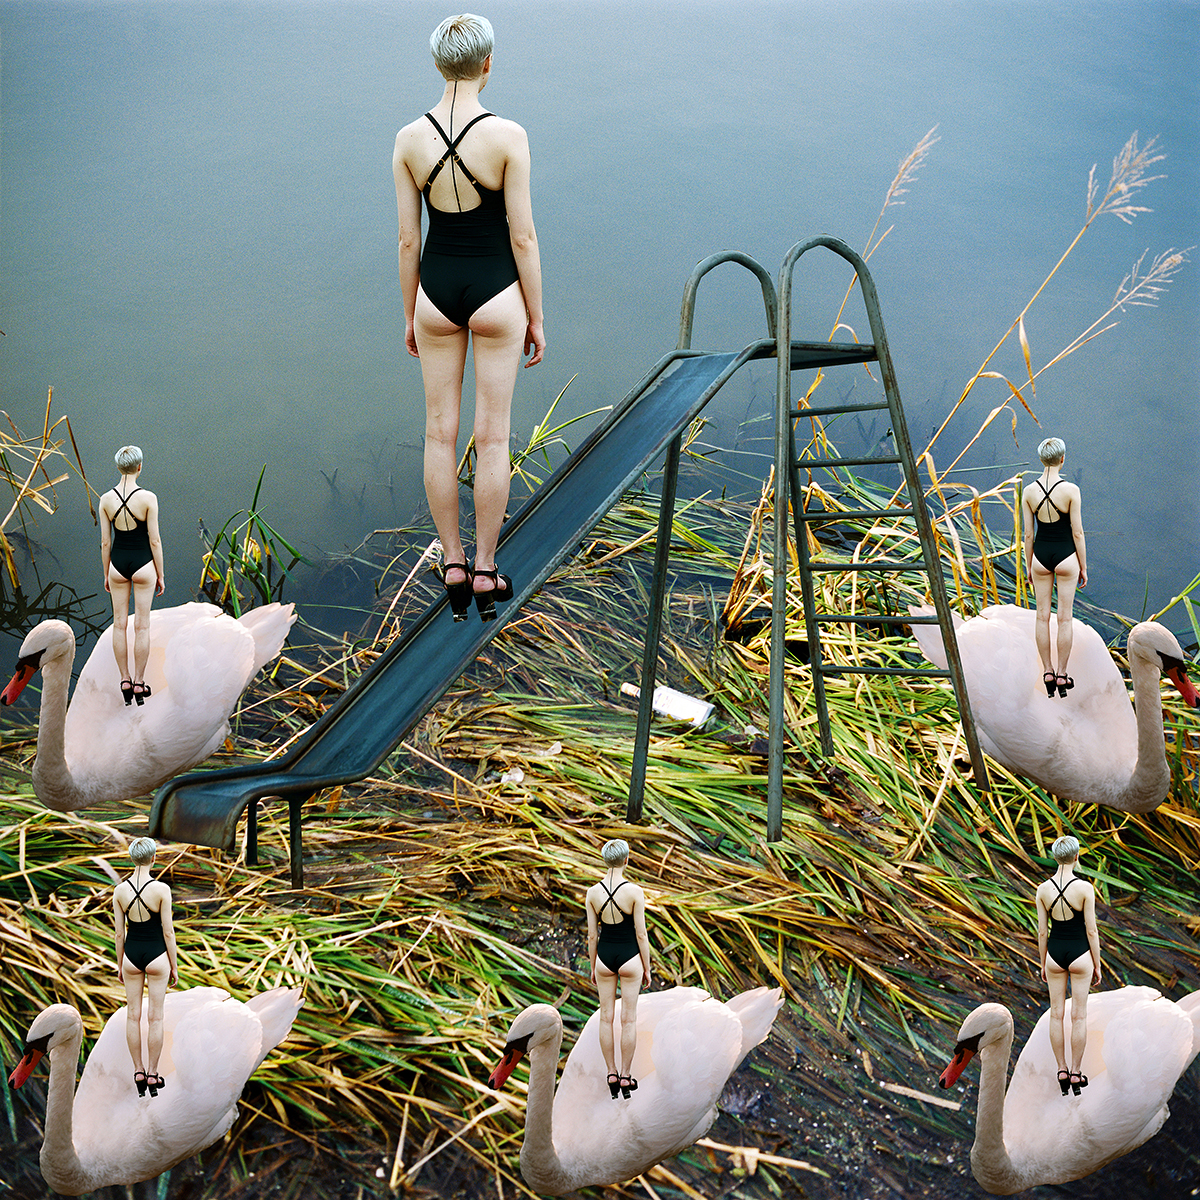 Work by Masha Svyatogor